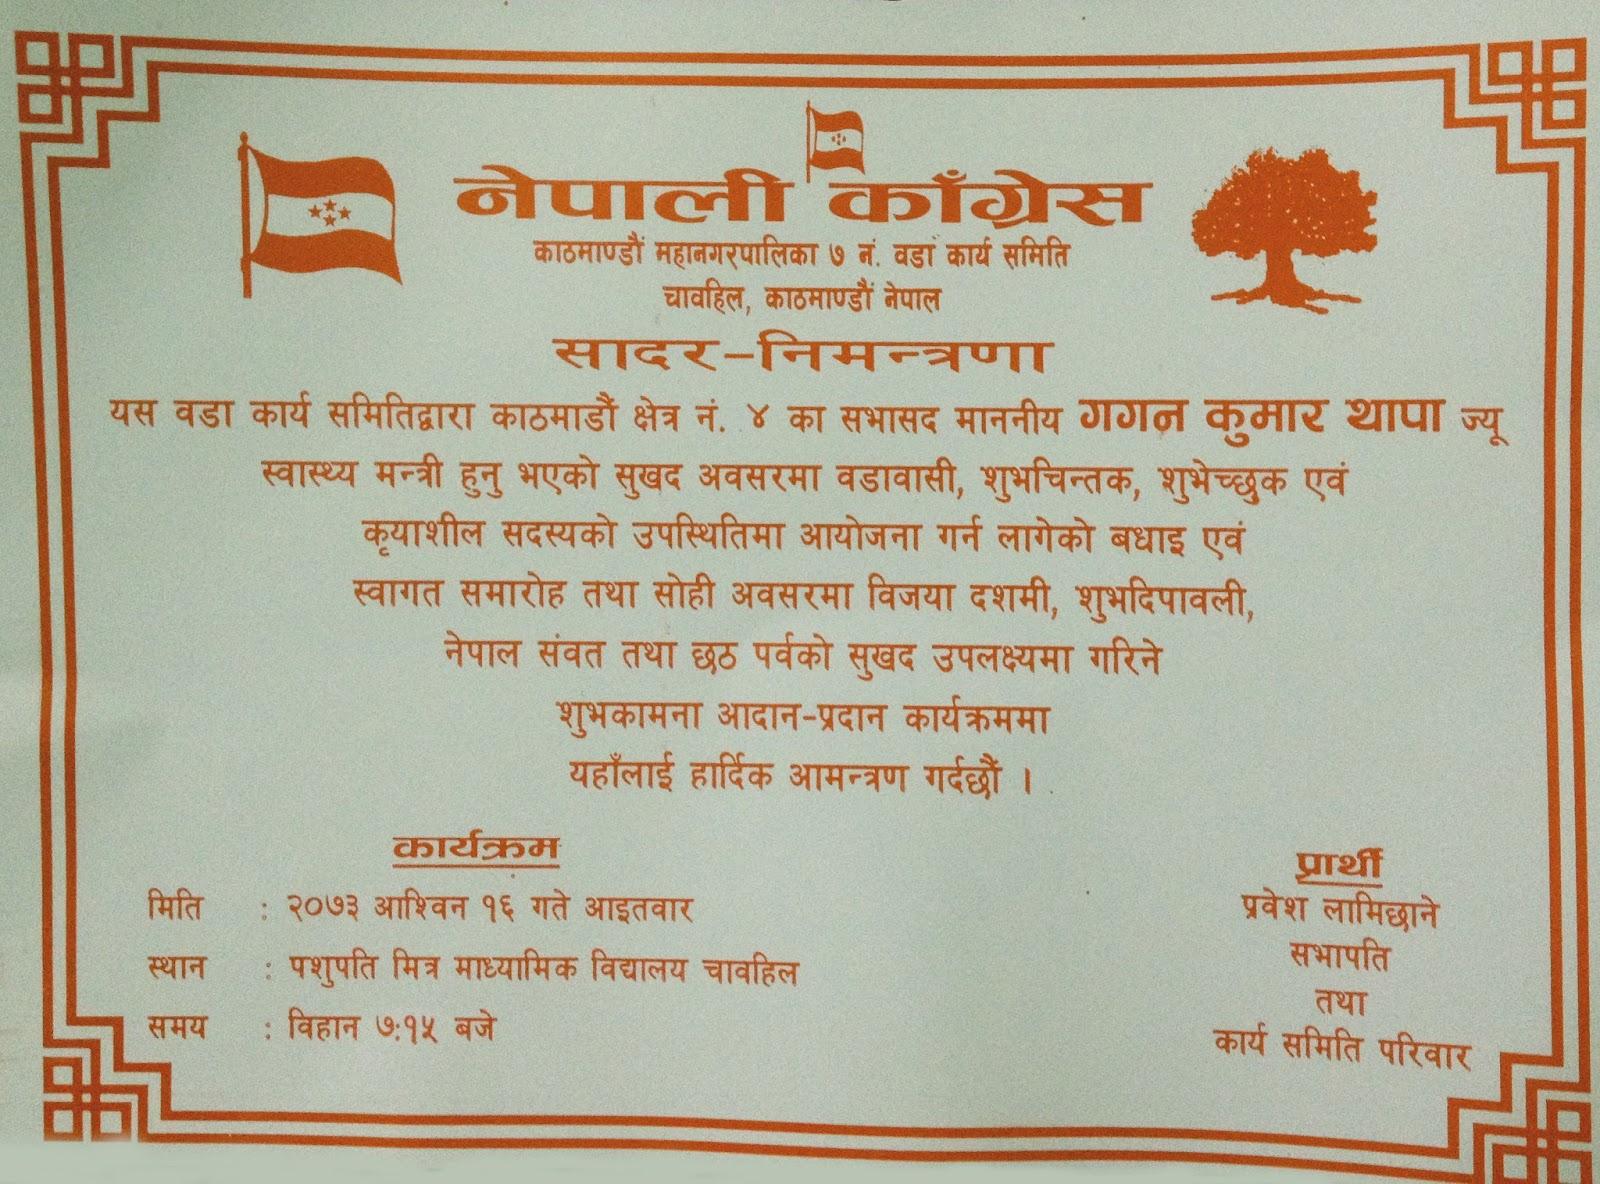 Nepali ritual invitation card invitation card in nepali choice image invitation sample stopboris Choice Image